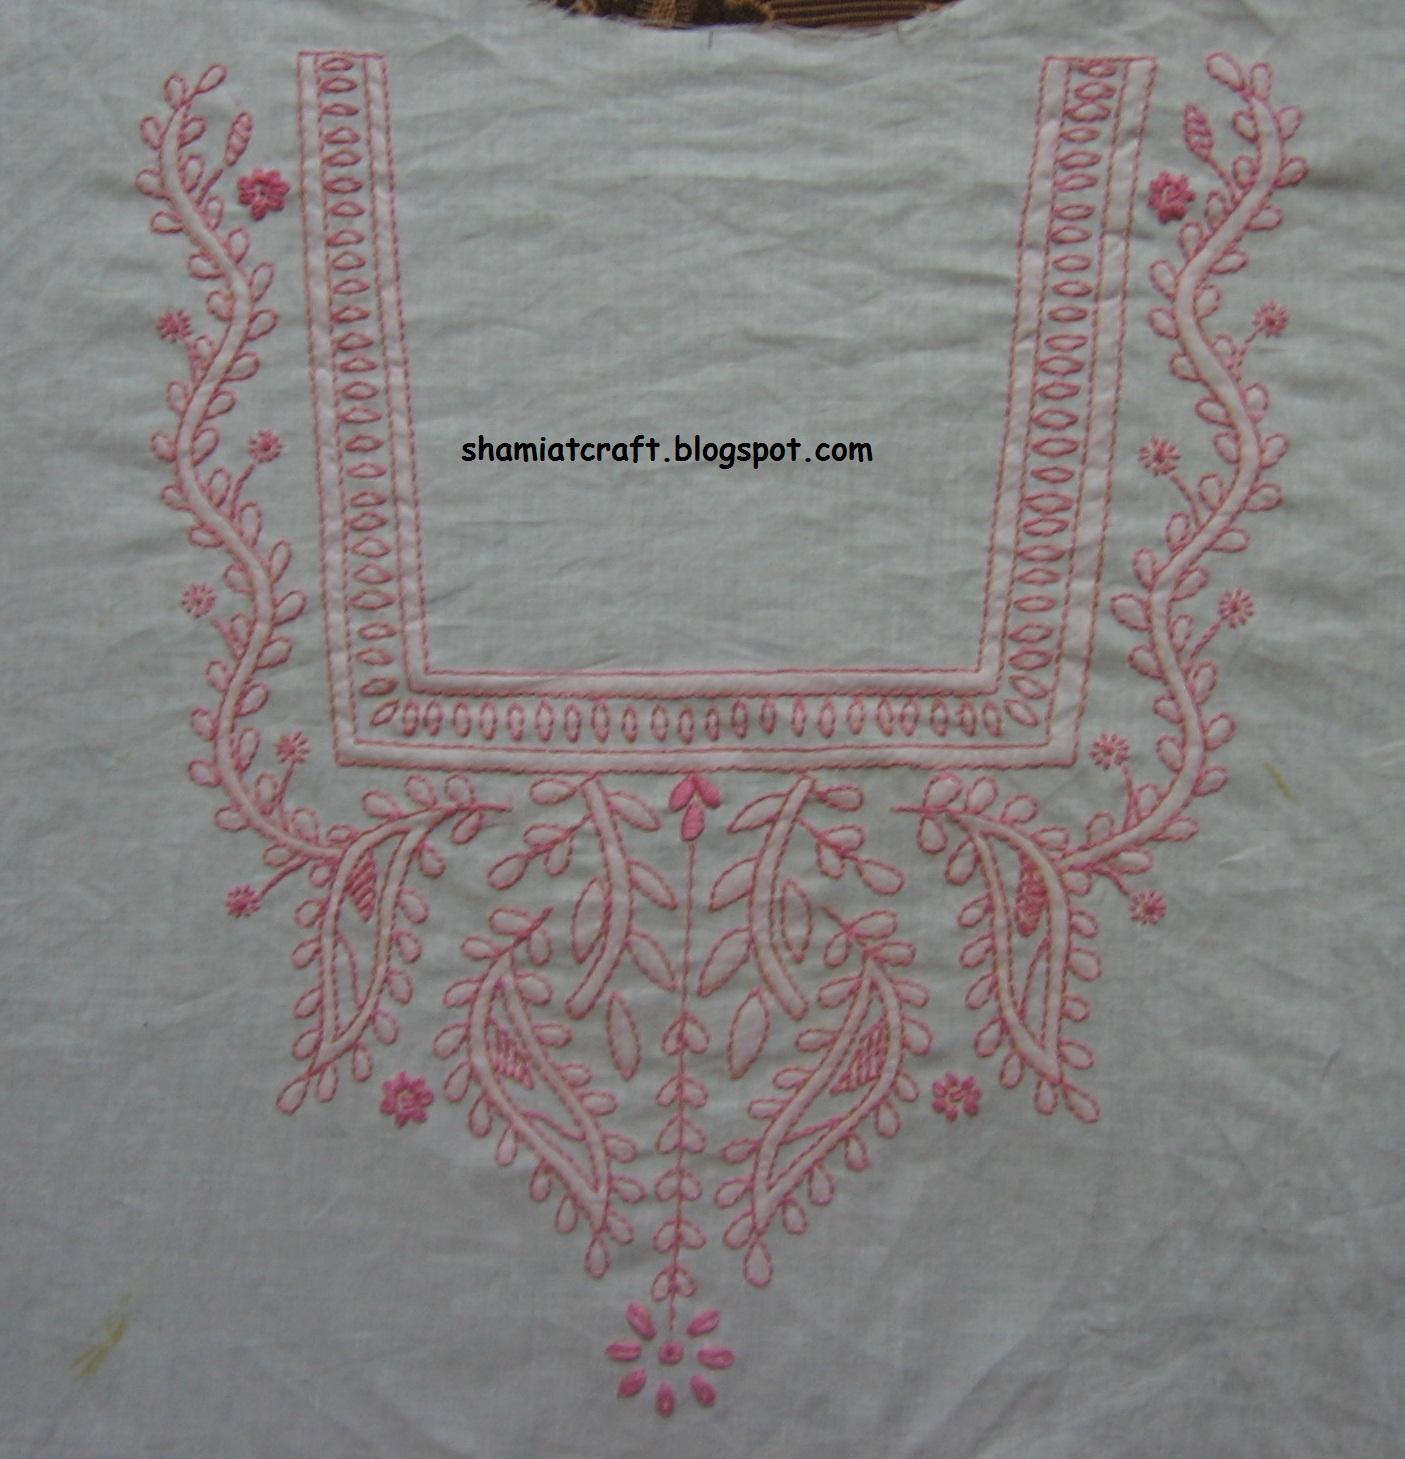 Motifs Of Chikankari Embroidery | Makaroka.com